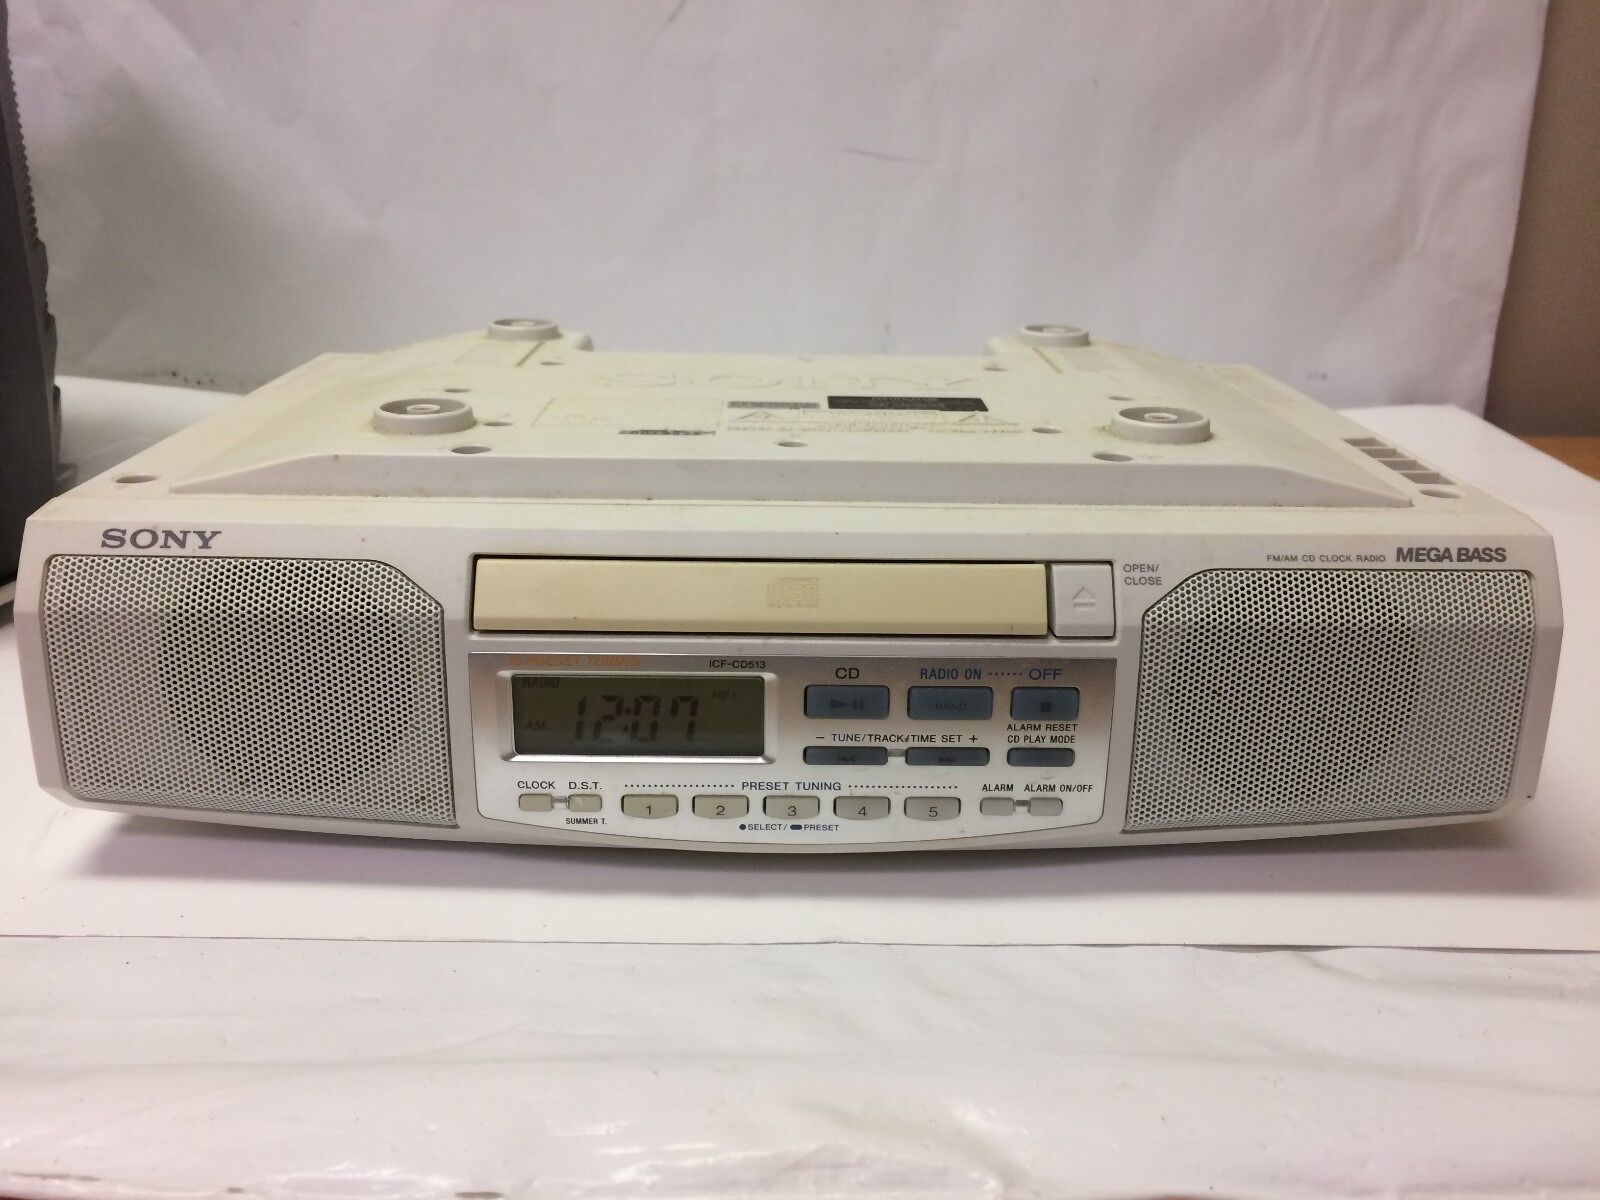 Sony ICF-CD513 Under Cabinet Counter Clock Radio AM FM CD Player